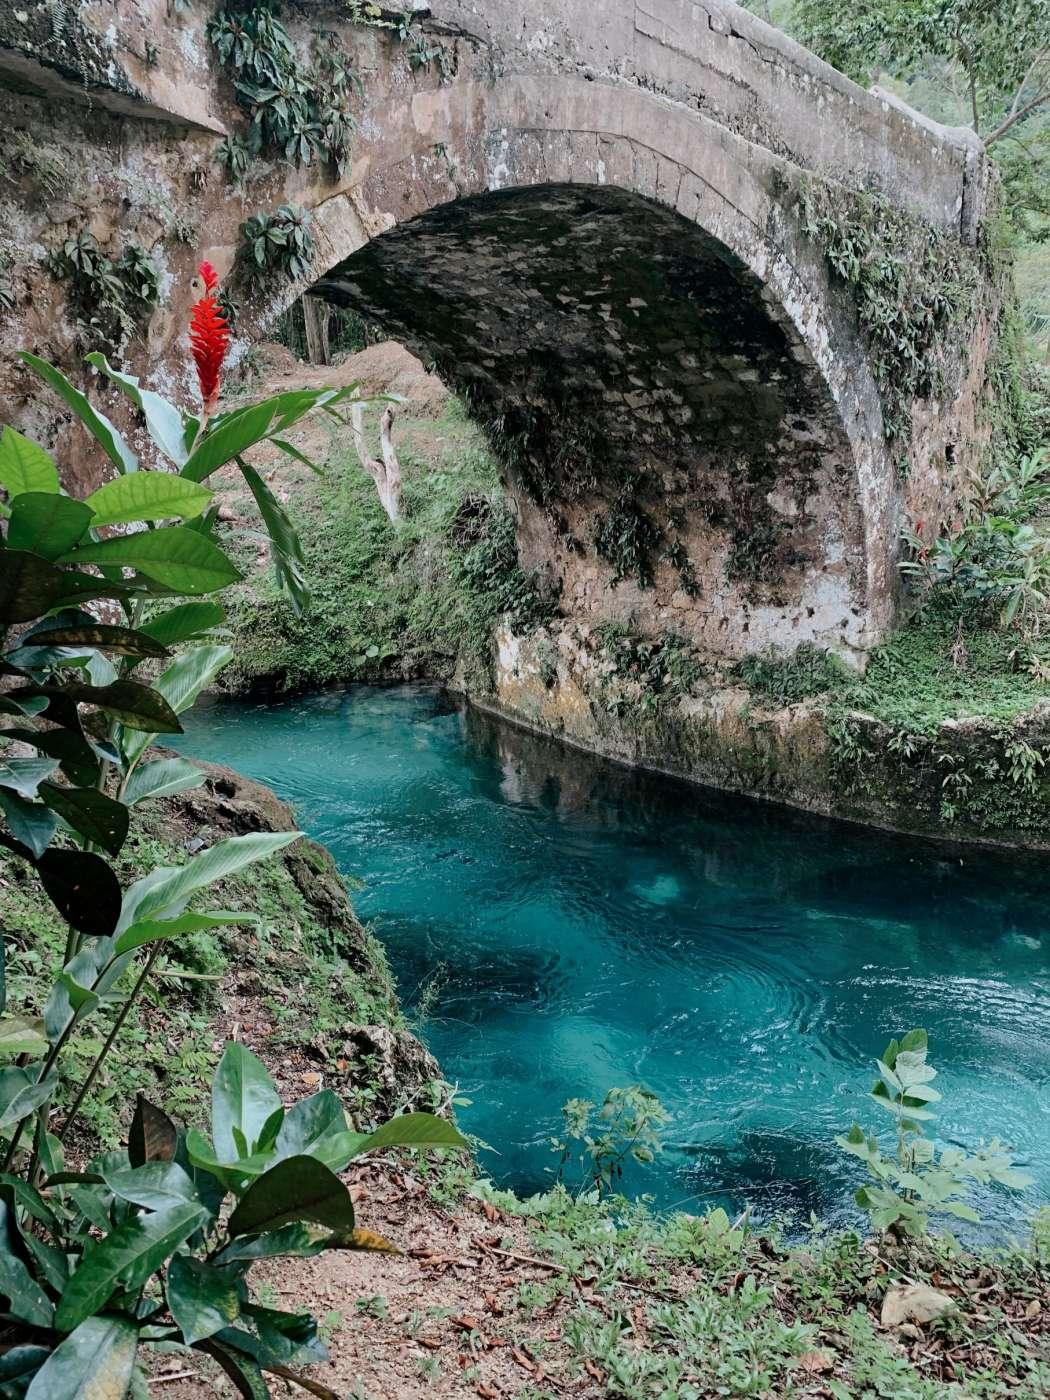 spanish-bridge-st.ann-jamaica